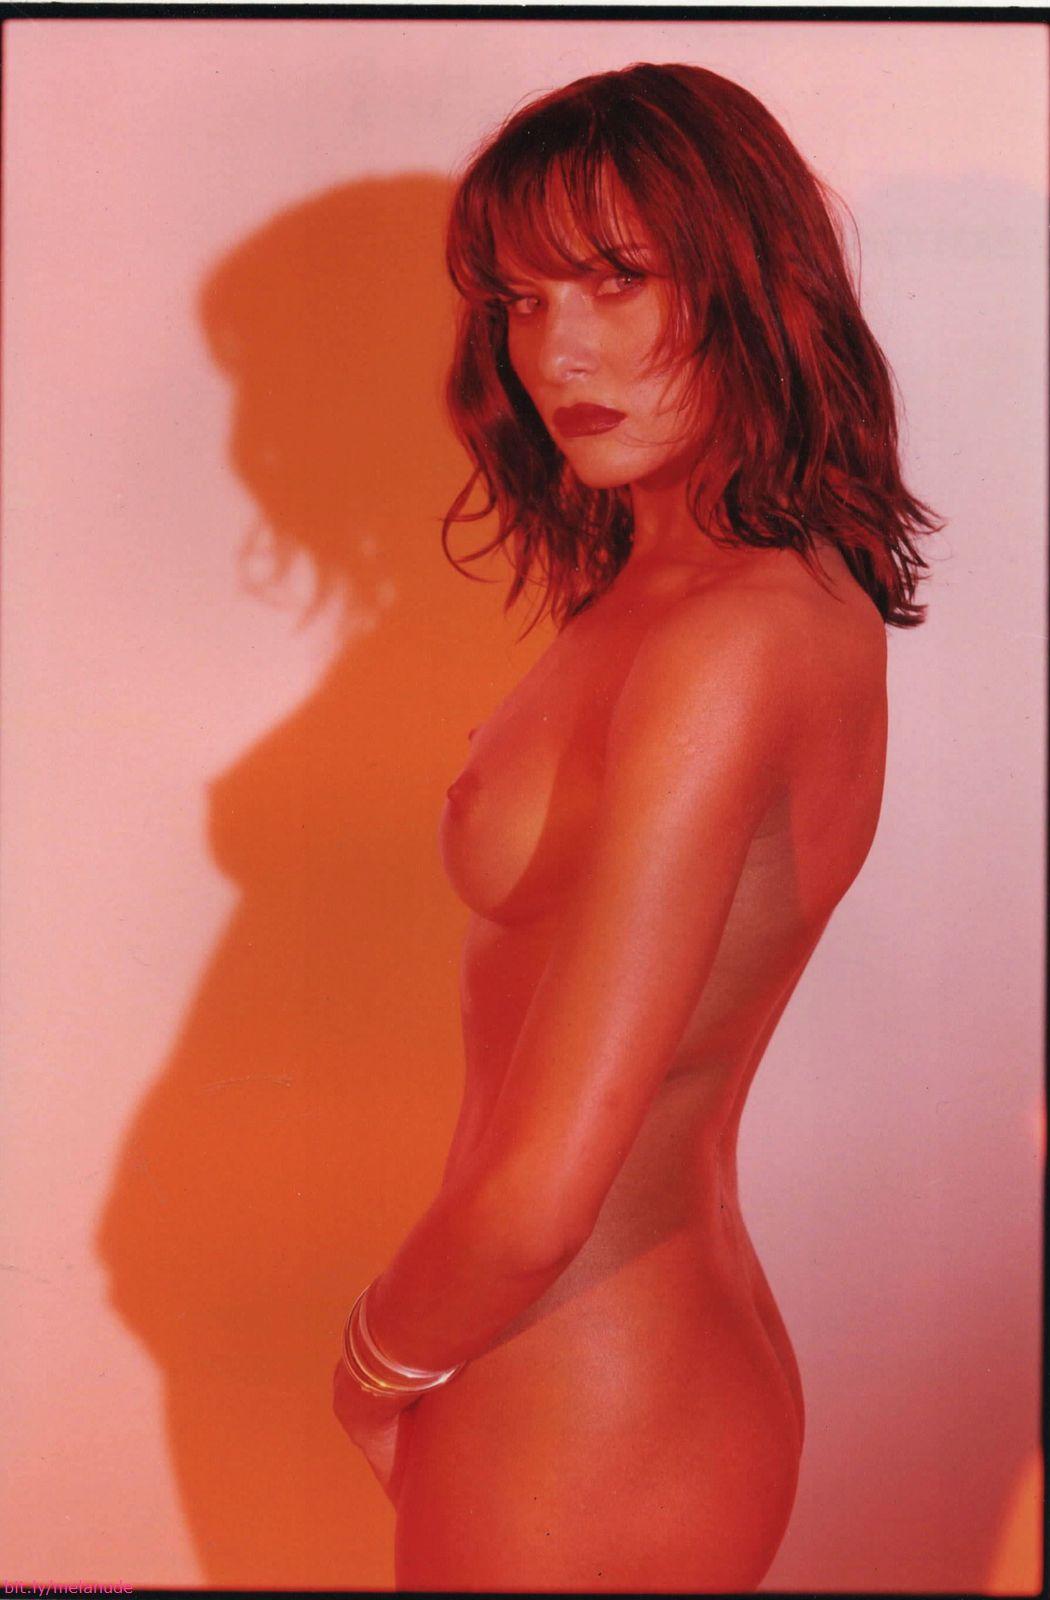 Actress sharon stone nude